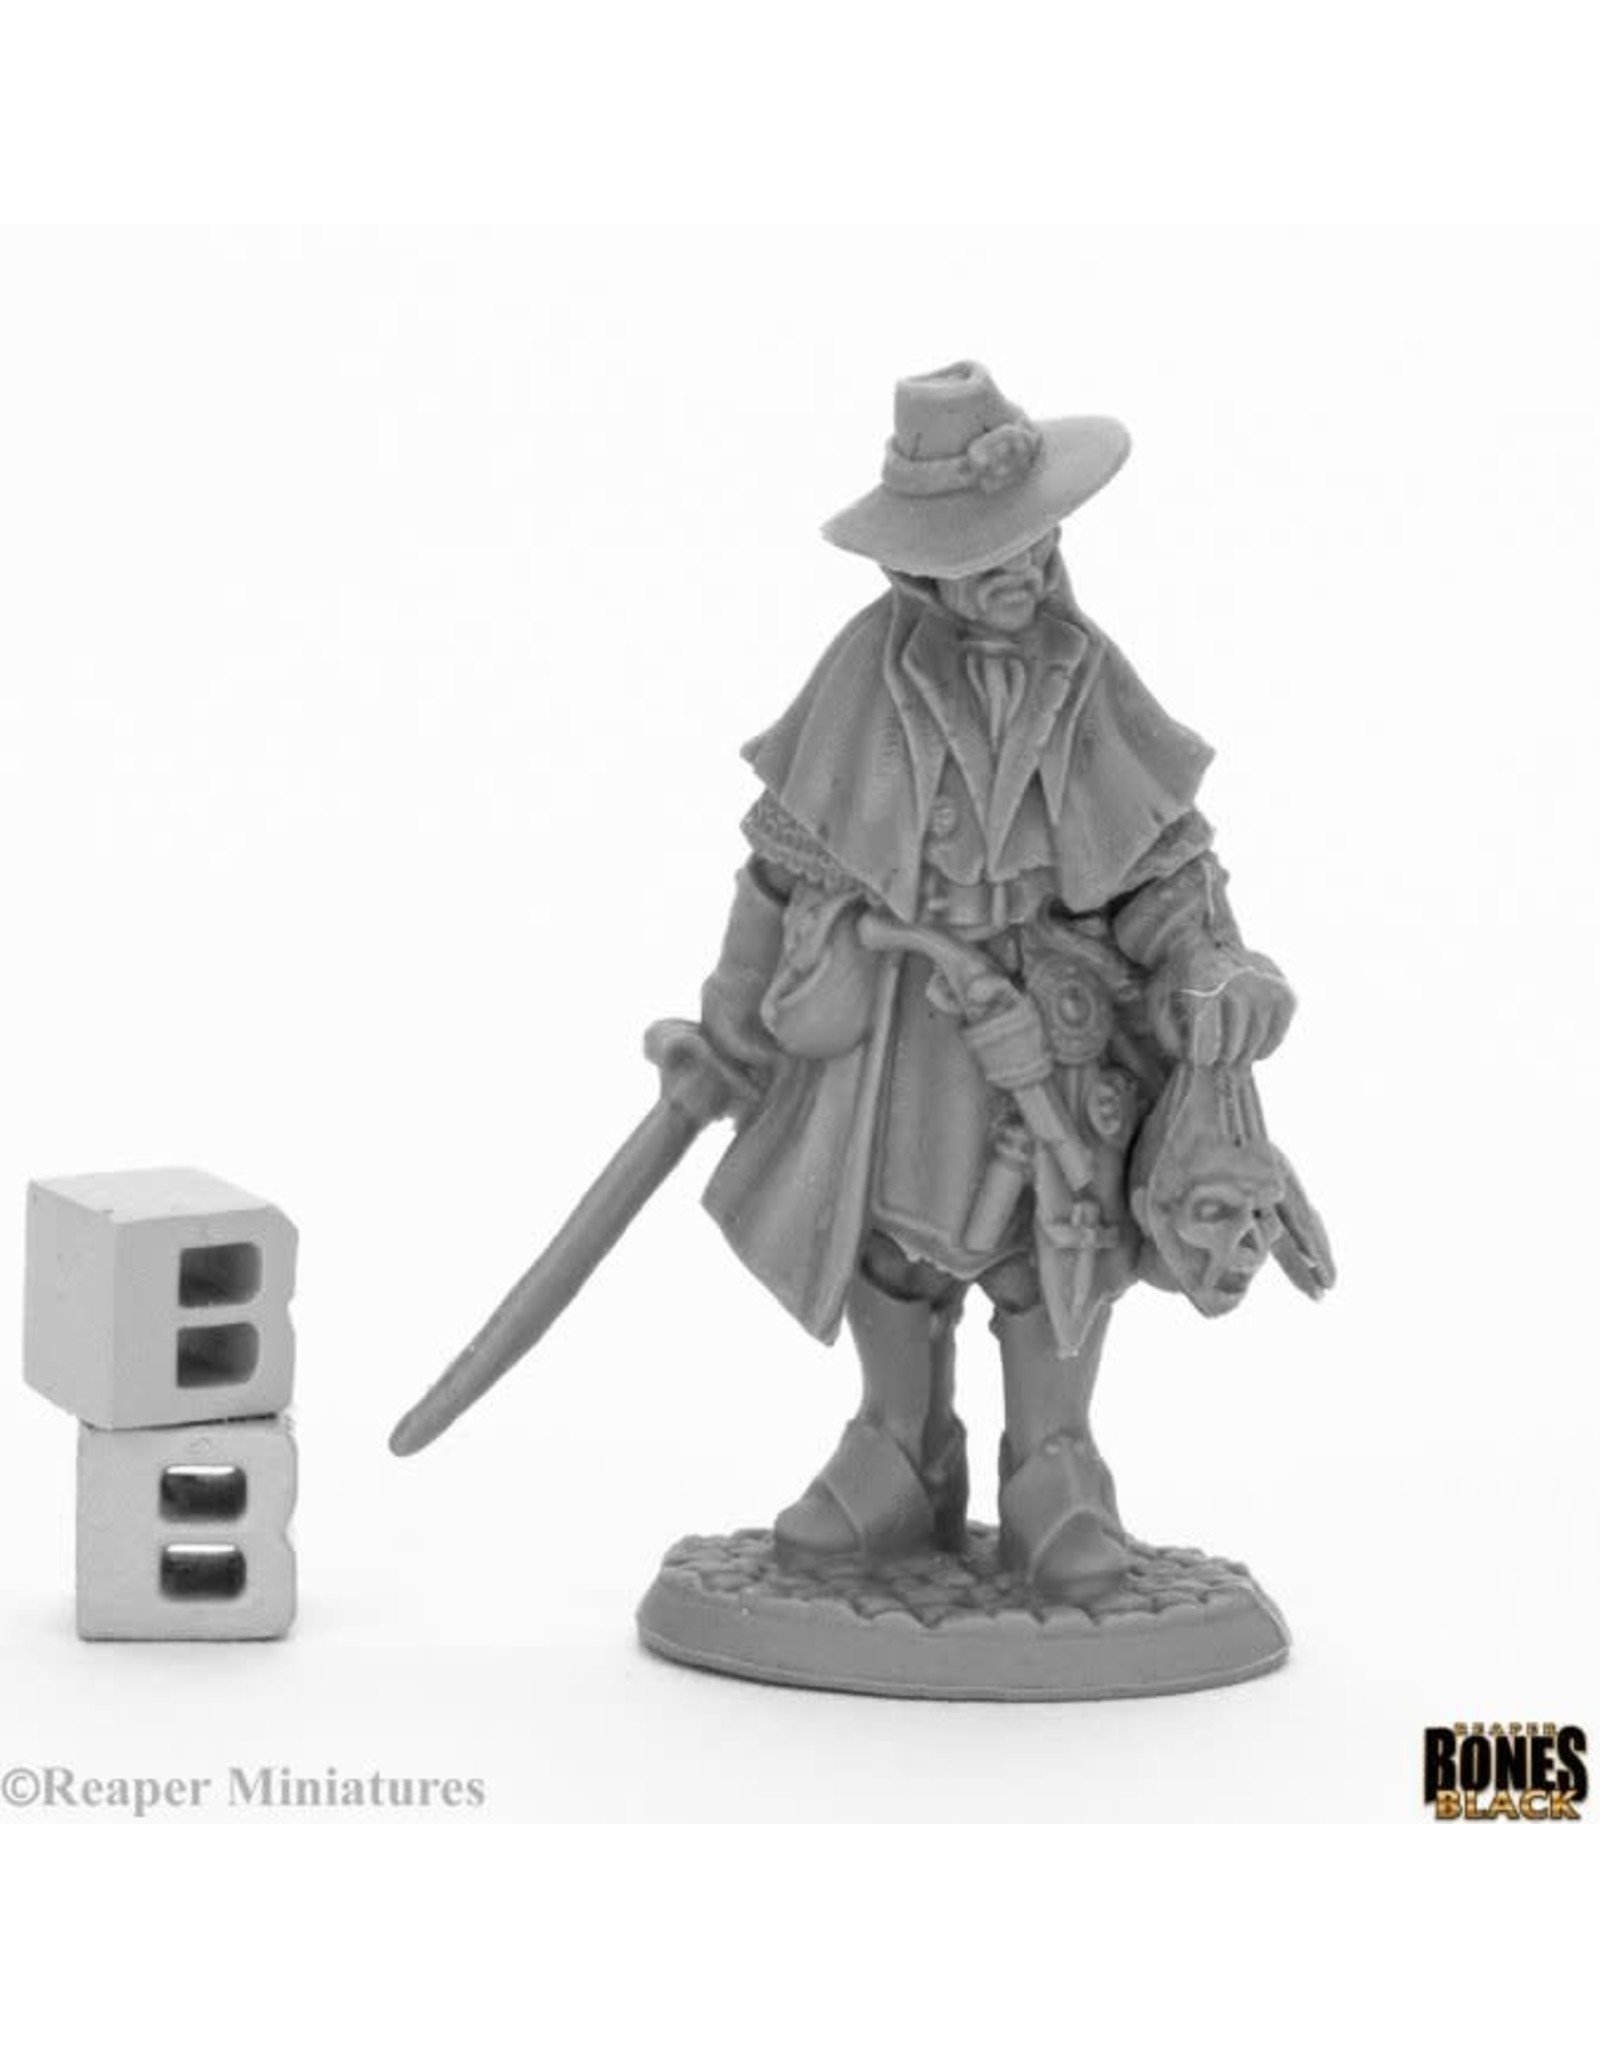 Reaper Reaper: Bones Black: Jakob Knochengard